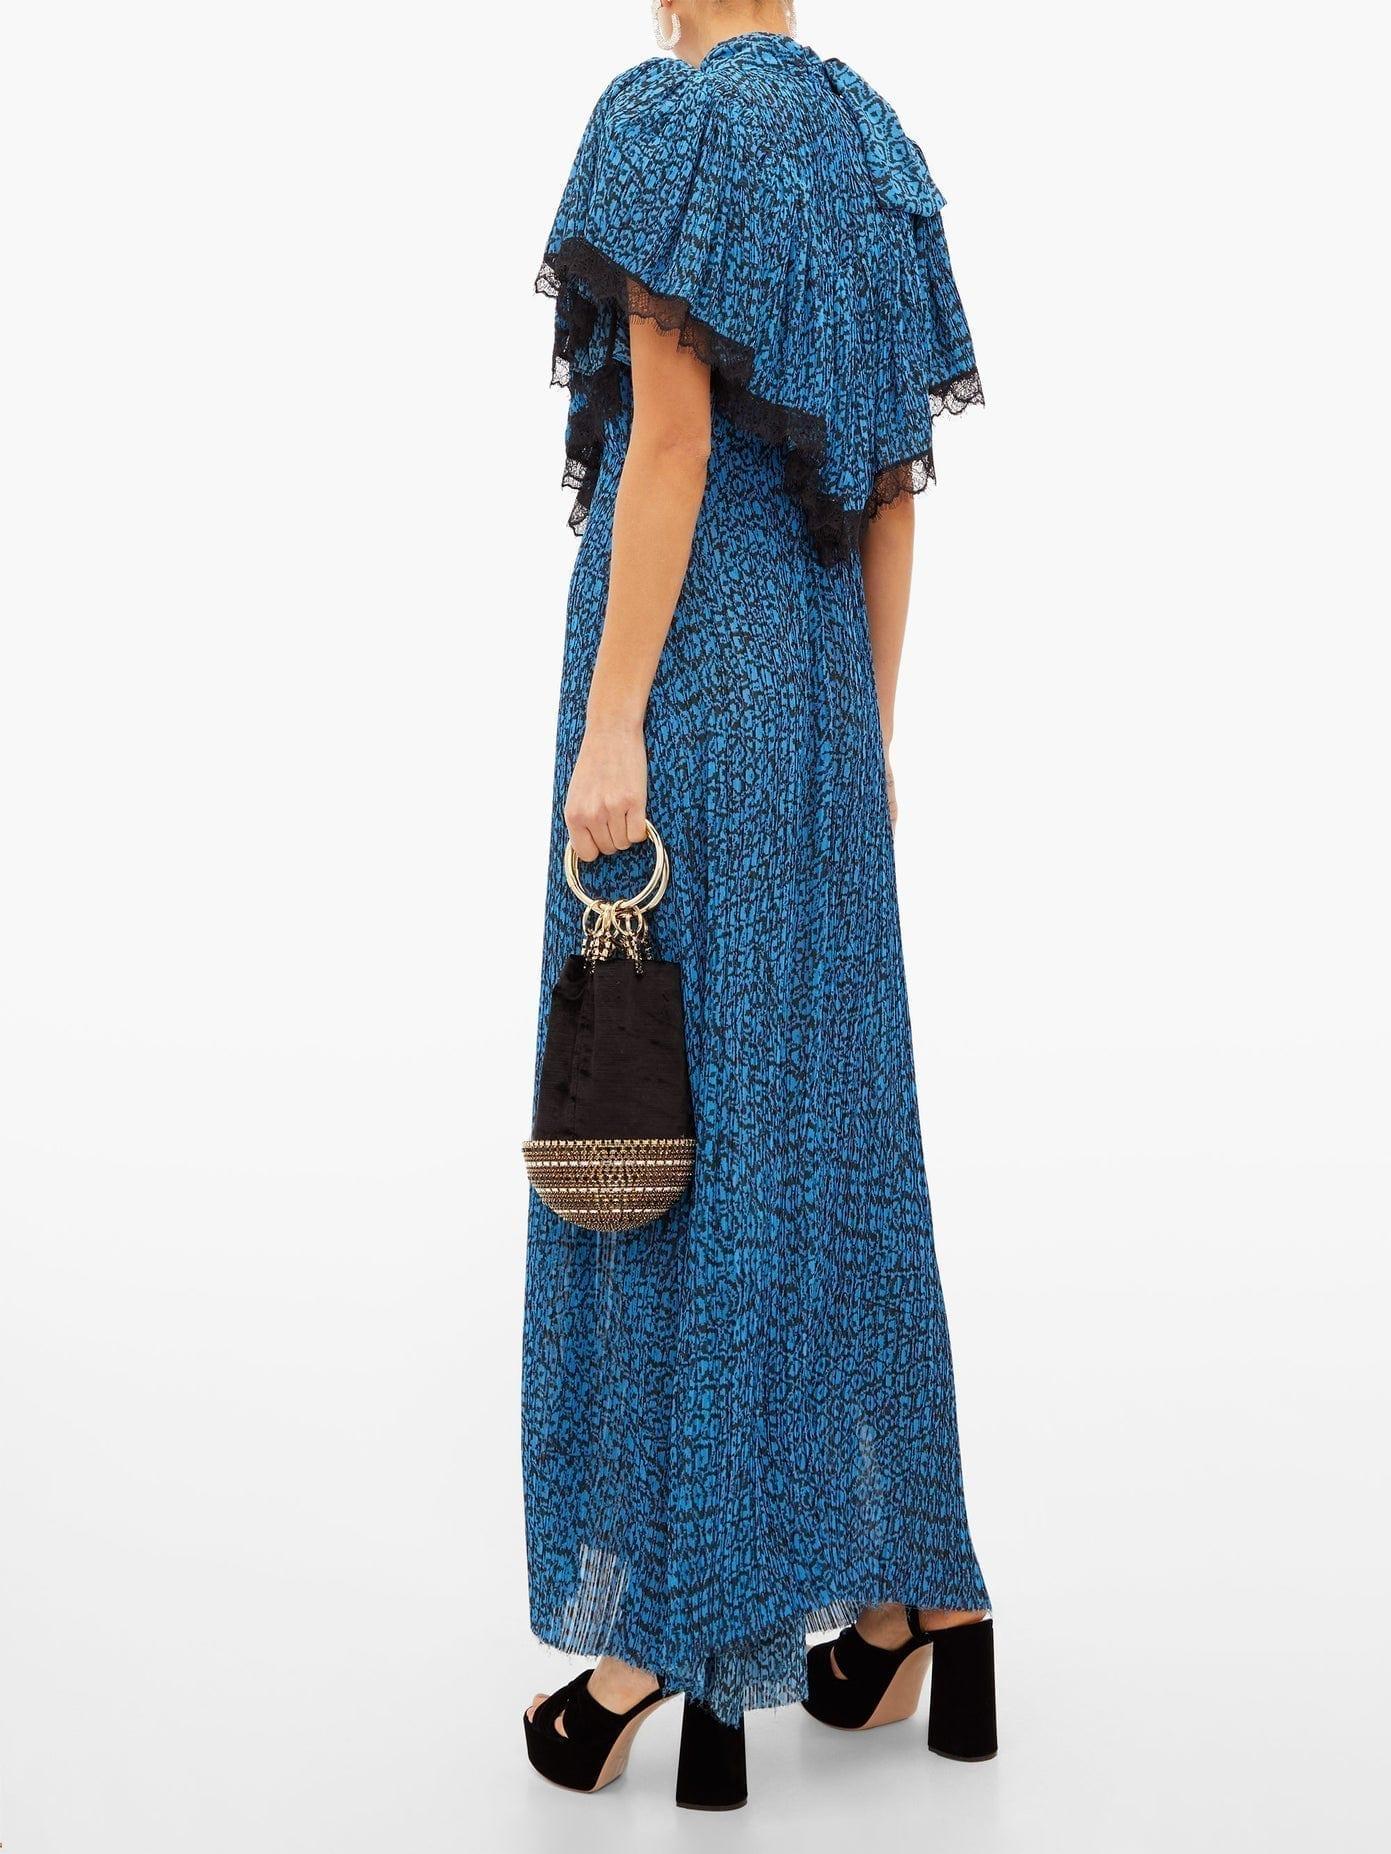 PREEN BY THORNTON BREGAZZI Epaine Abstract-print Plissé-chiffon Maxi Dress